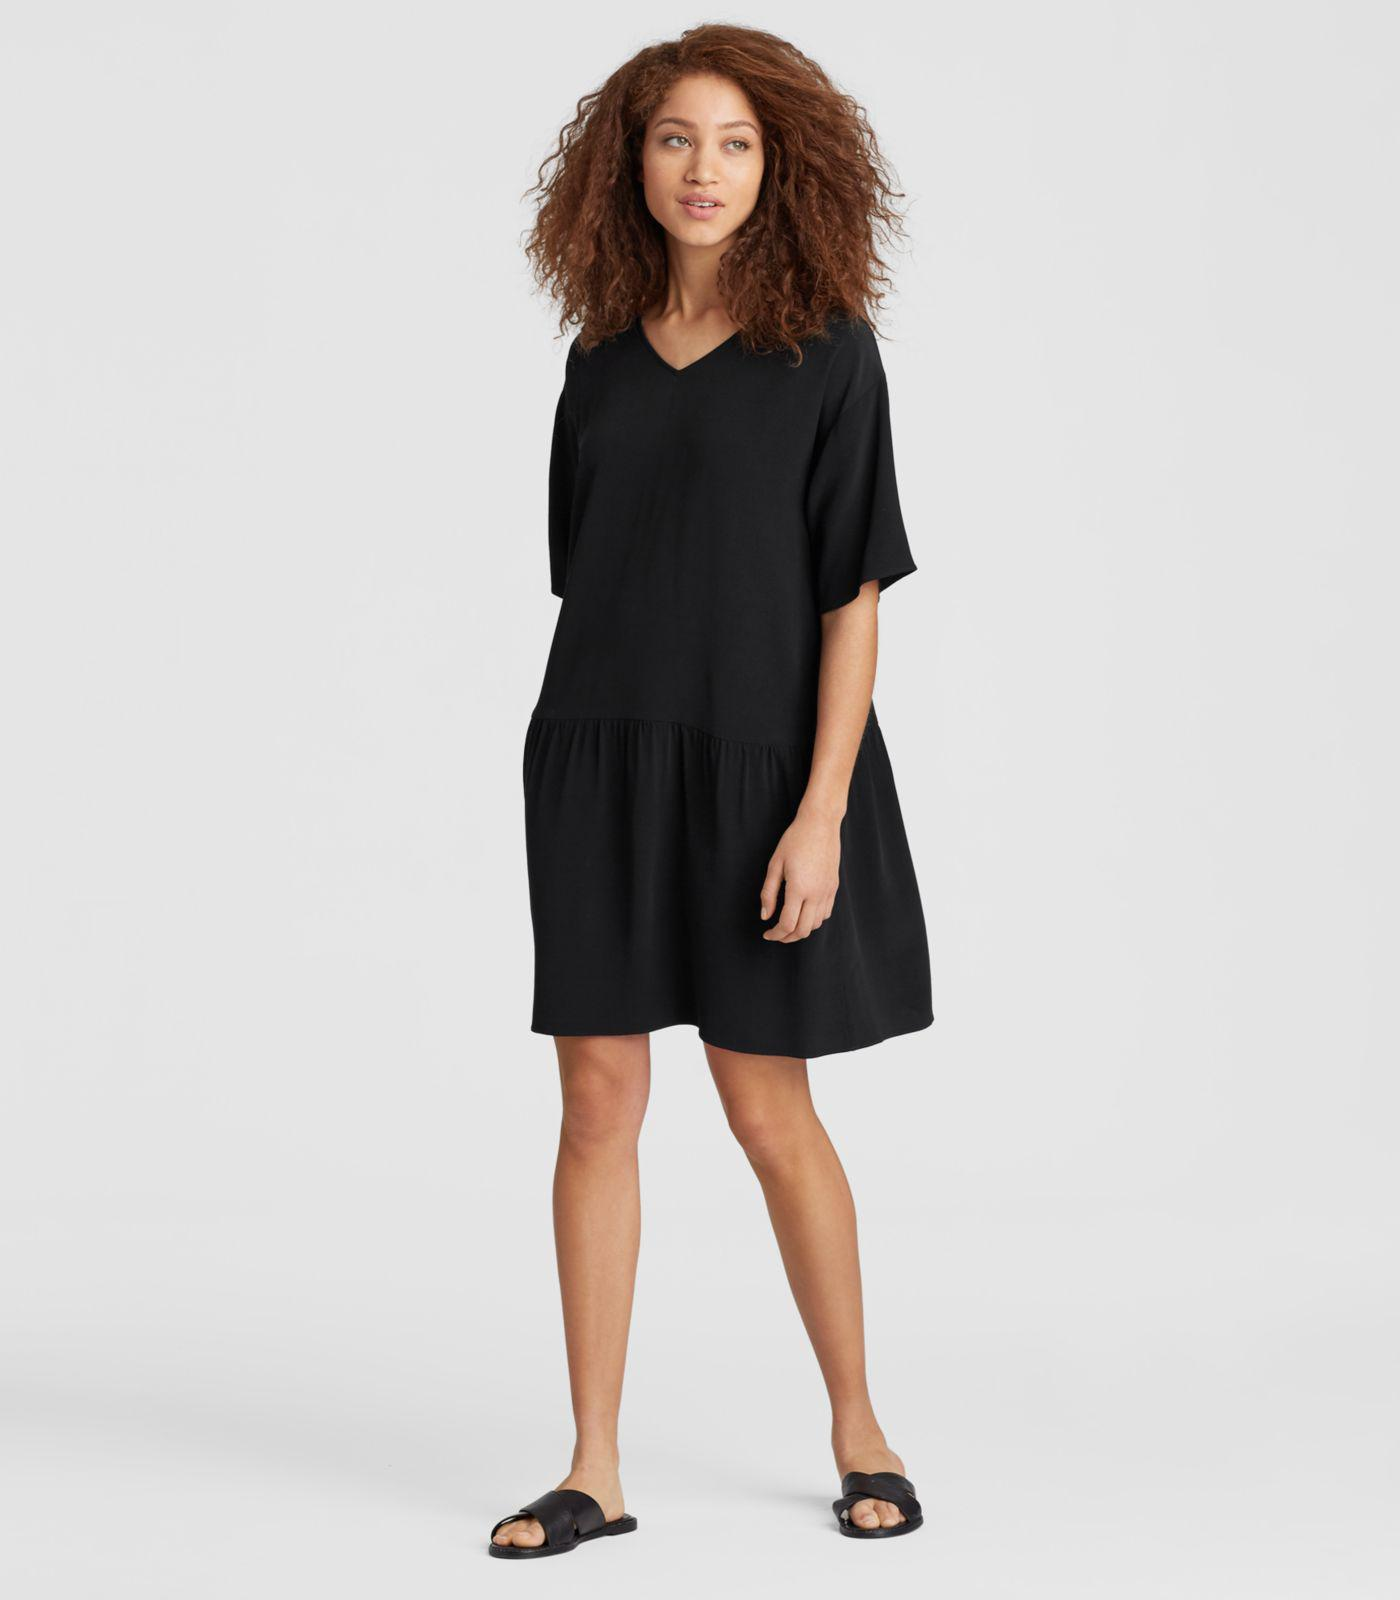 e8b9596b33 Lyst - Eileen Fisher Viscose Crepe Drop-waist Dress in Black